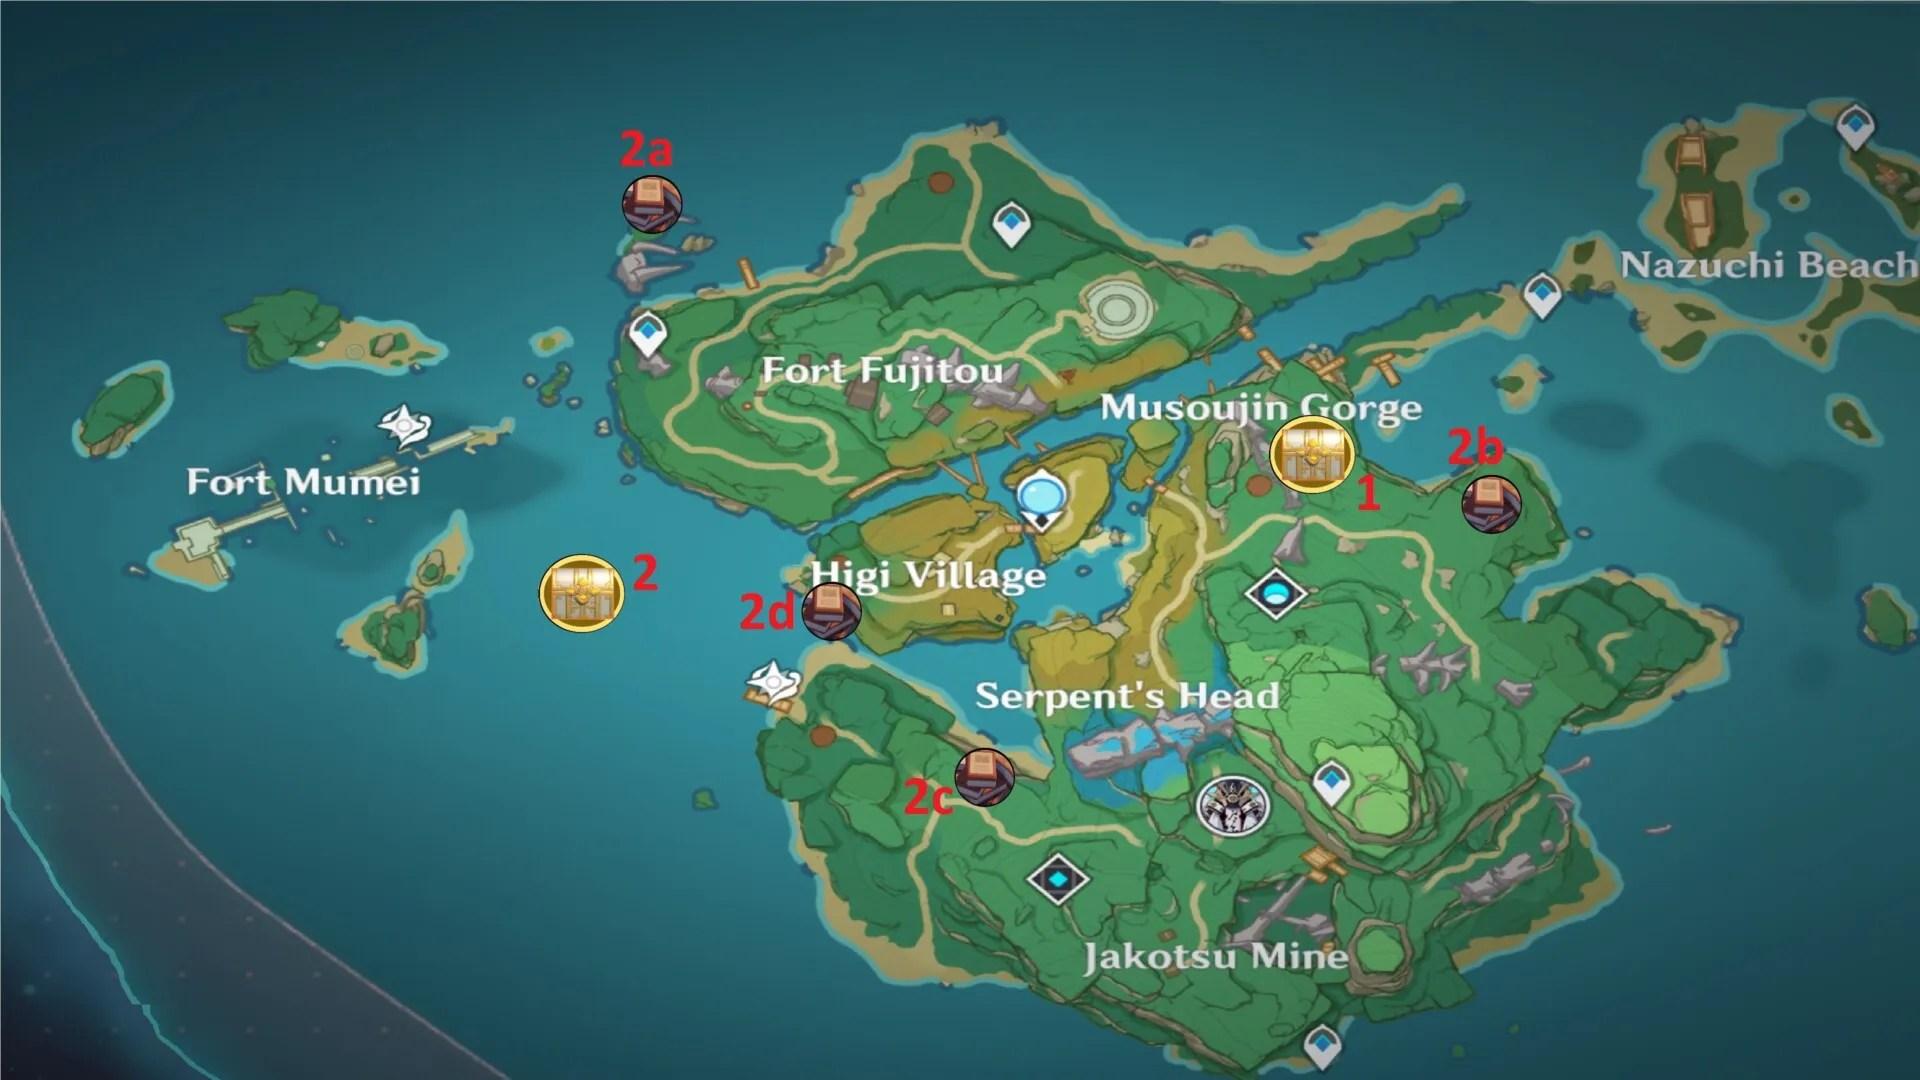 Yashiori island 0 / 115. Genshin Impact Yashiori Island Luxurious Chest Locations Guide